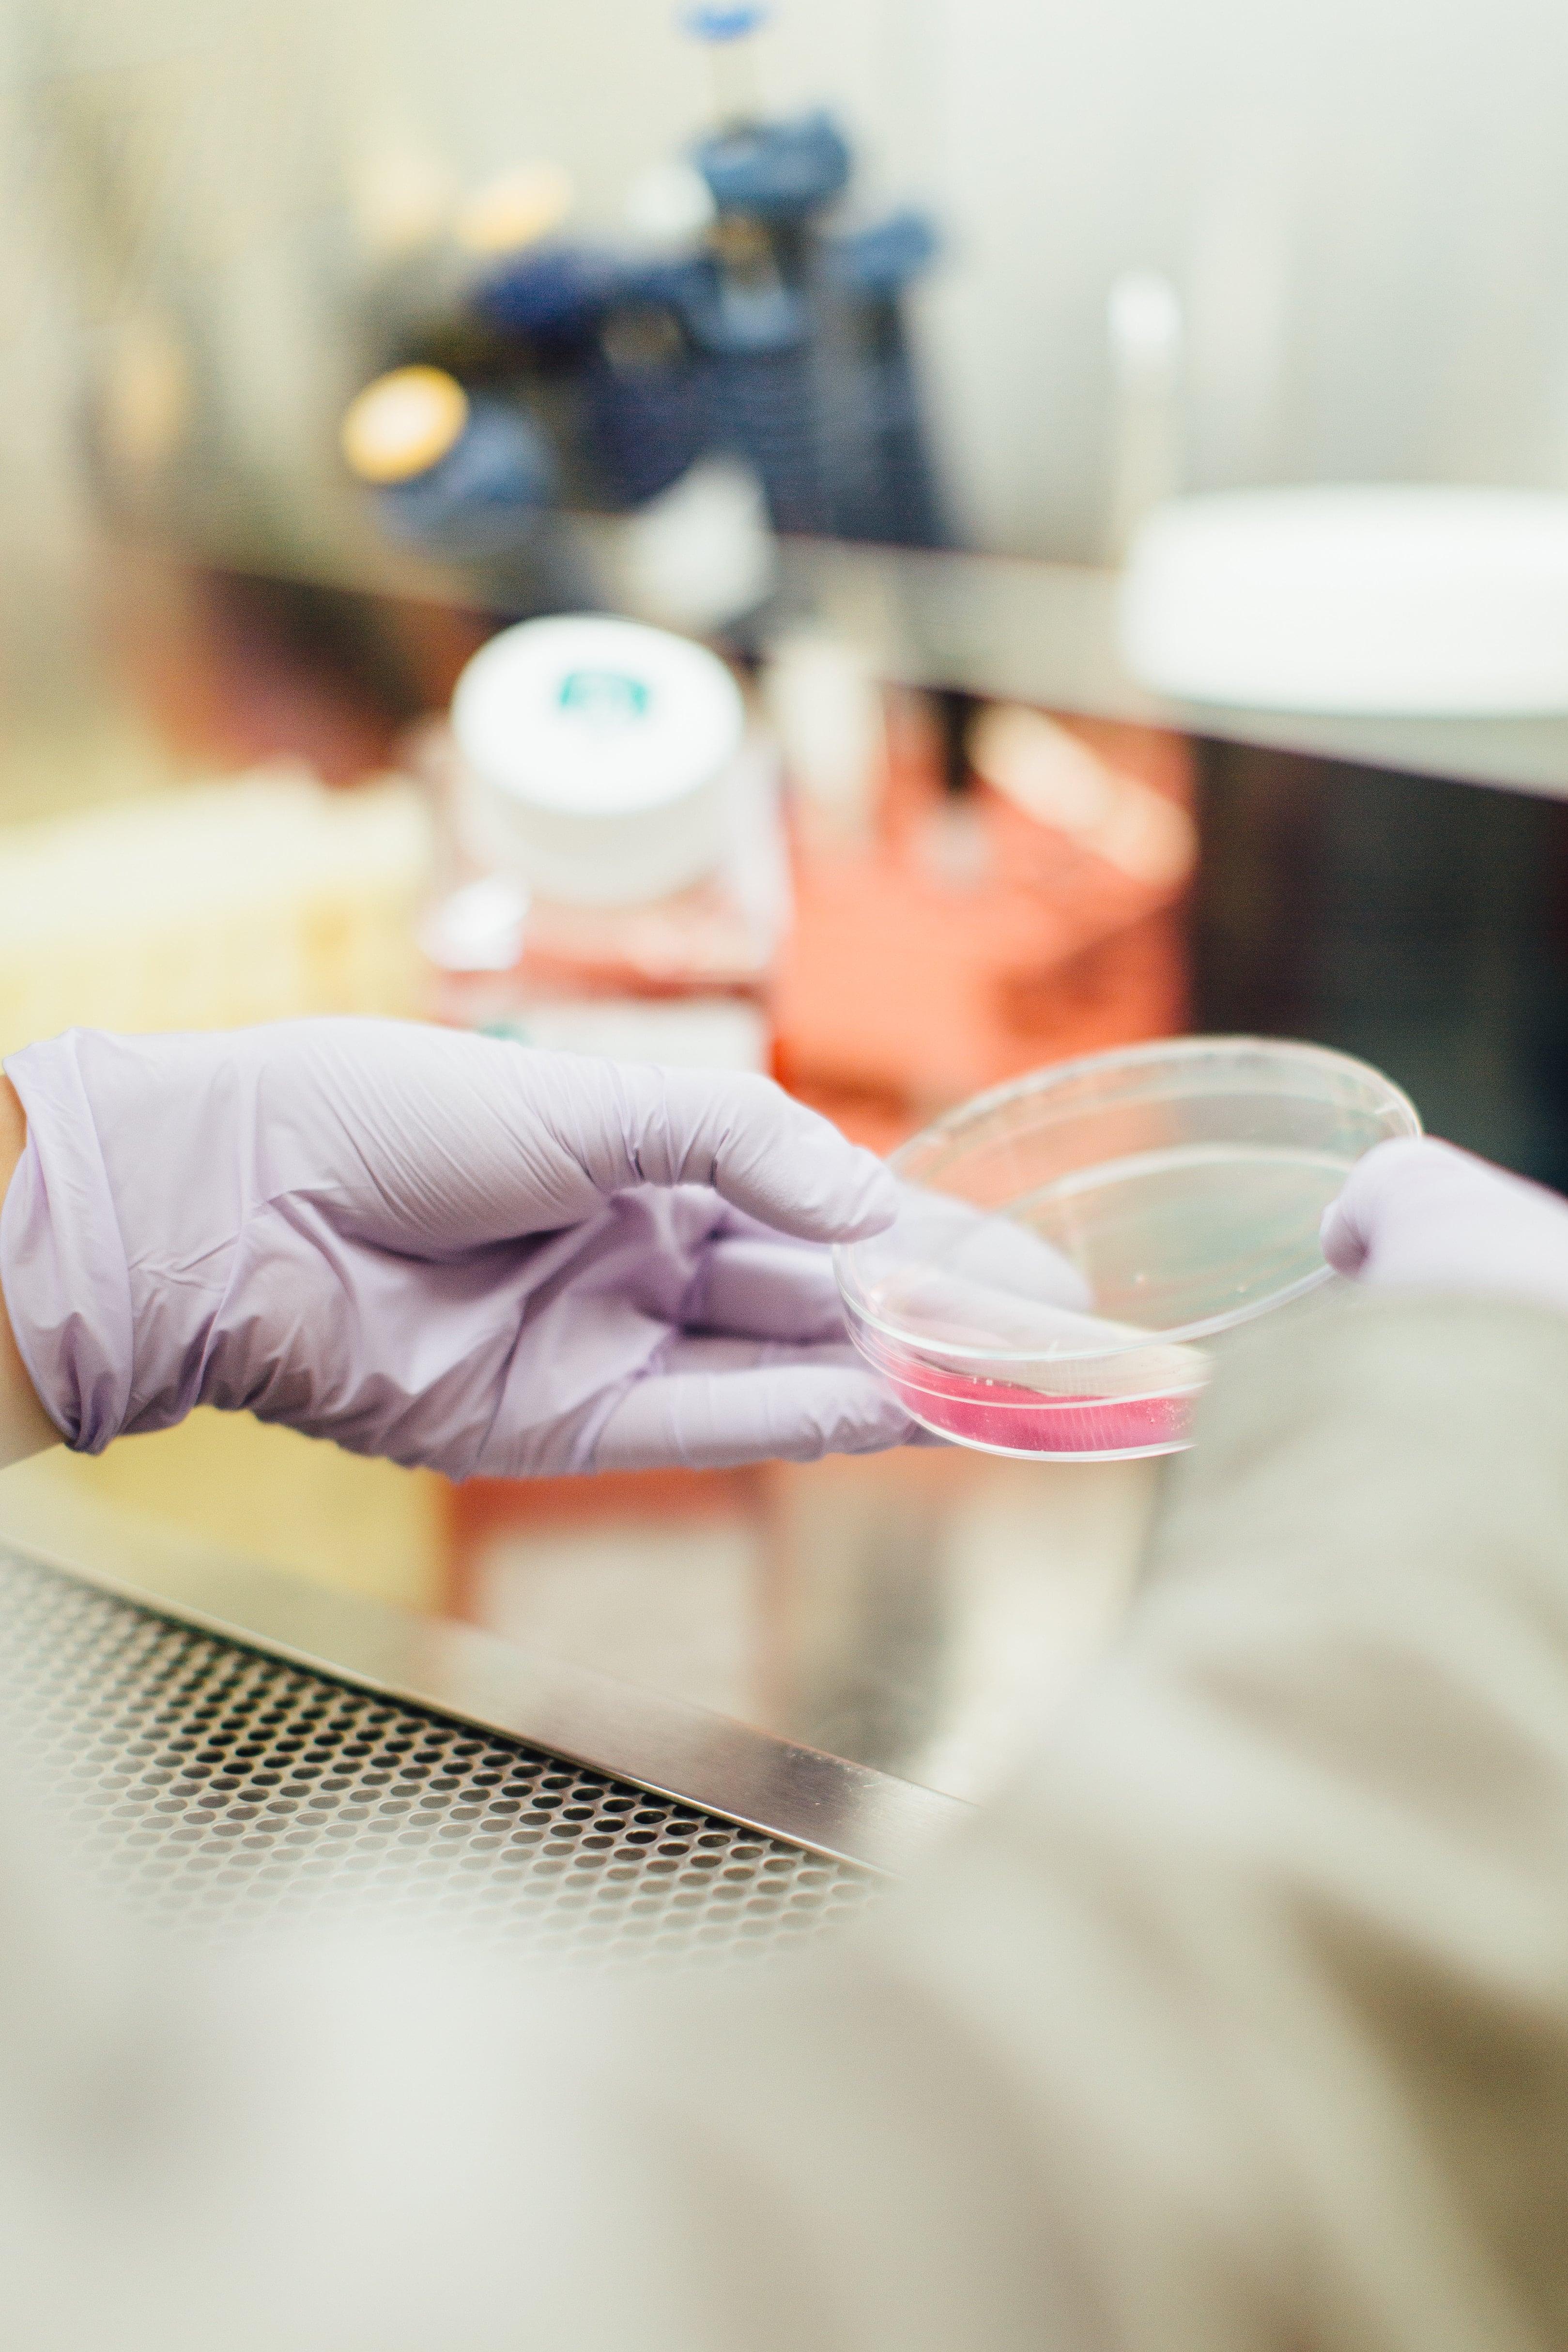 cells science petri dish